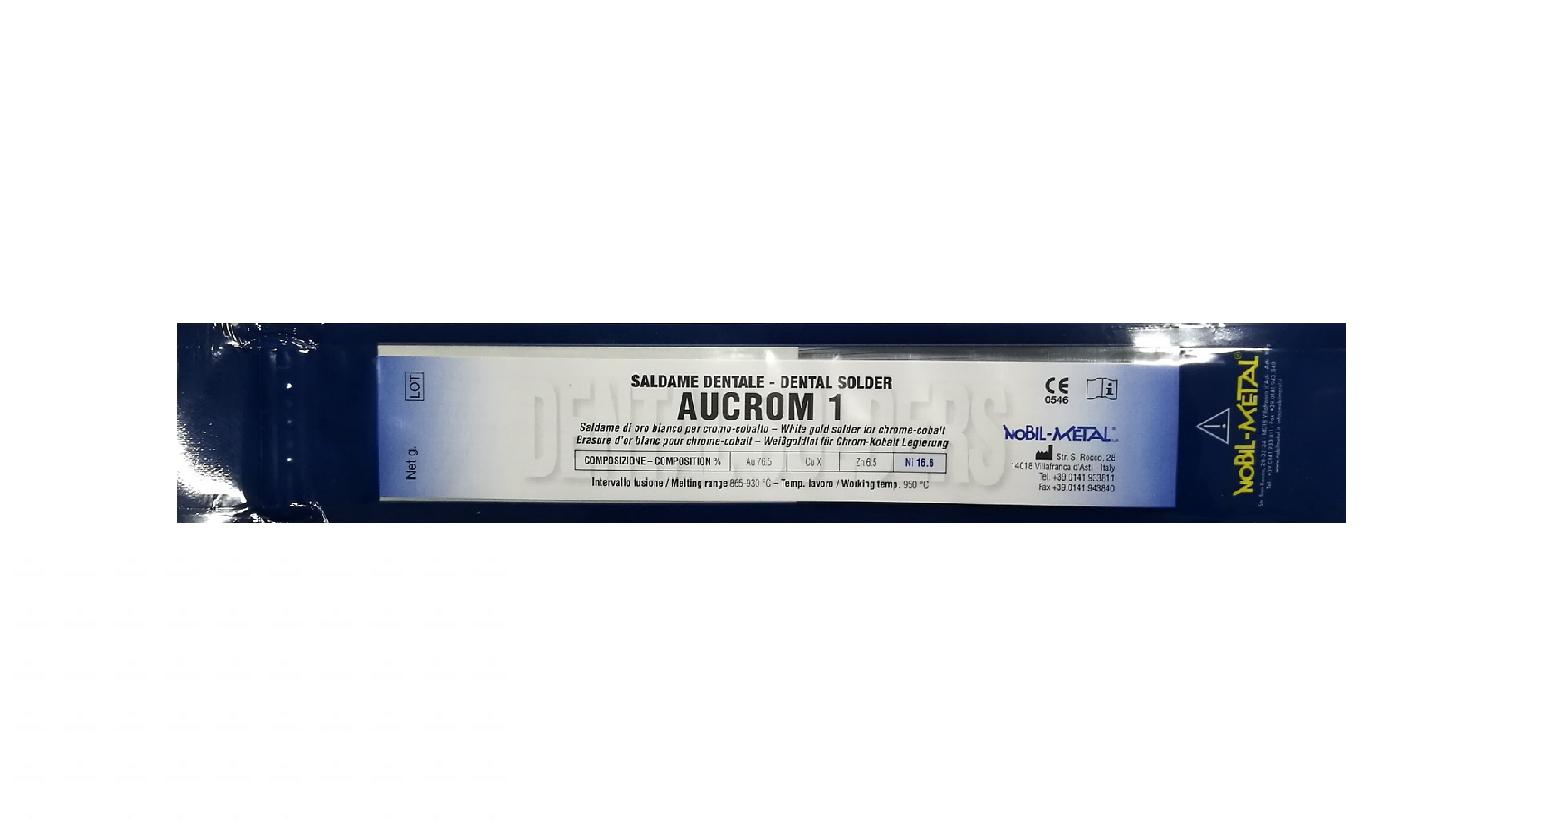 NOBIL METAL AUCROM 1 LV22 (CEKA SOL  W CS22) - Lot in Röhrenform mit integriertem Flussmittel, weiß 865-930°C